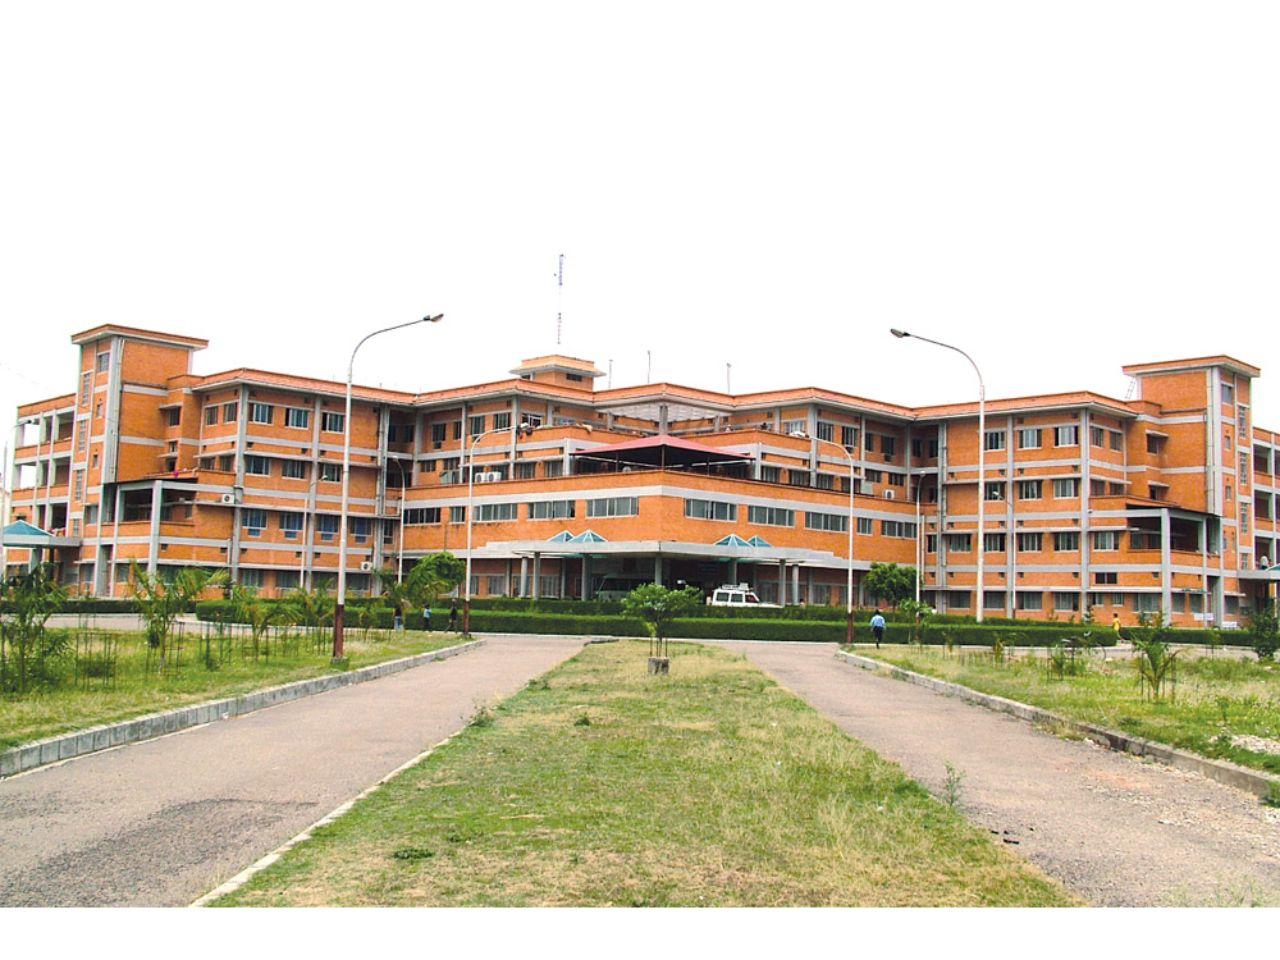 Nepalgunj Medical College